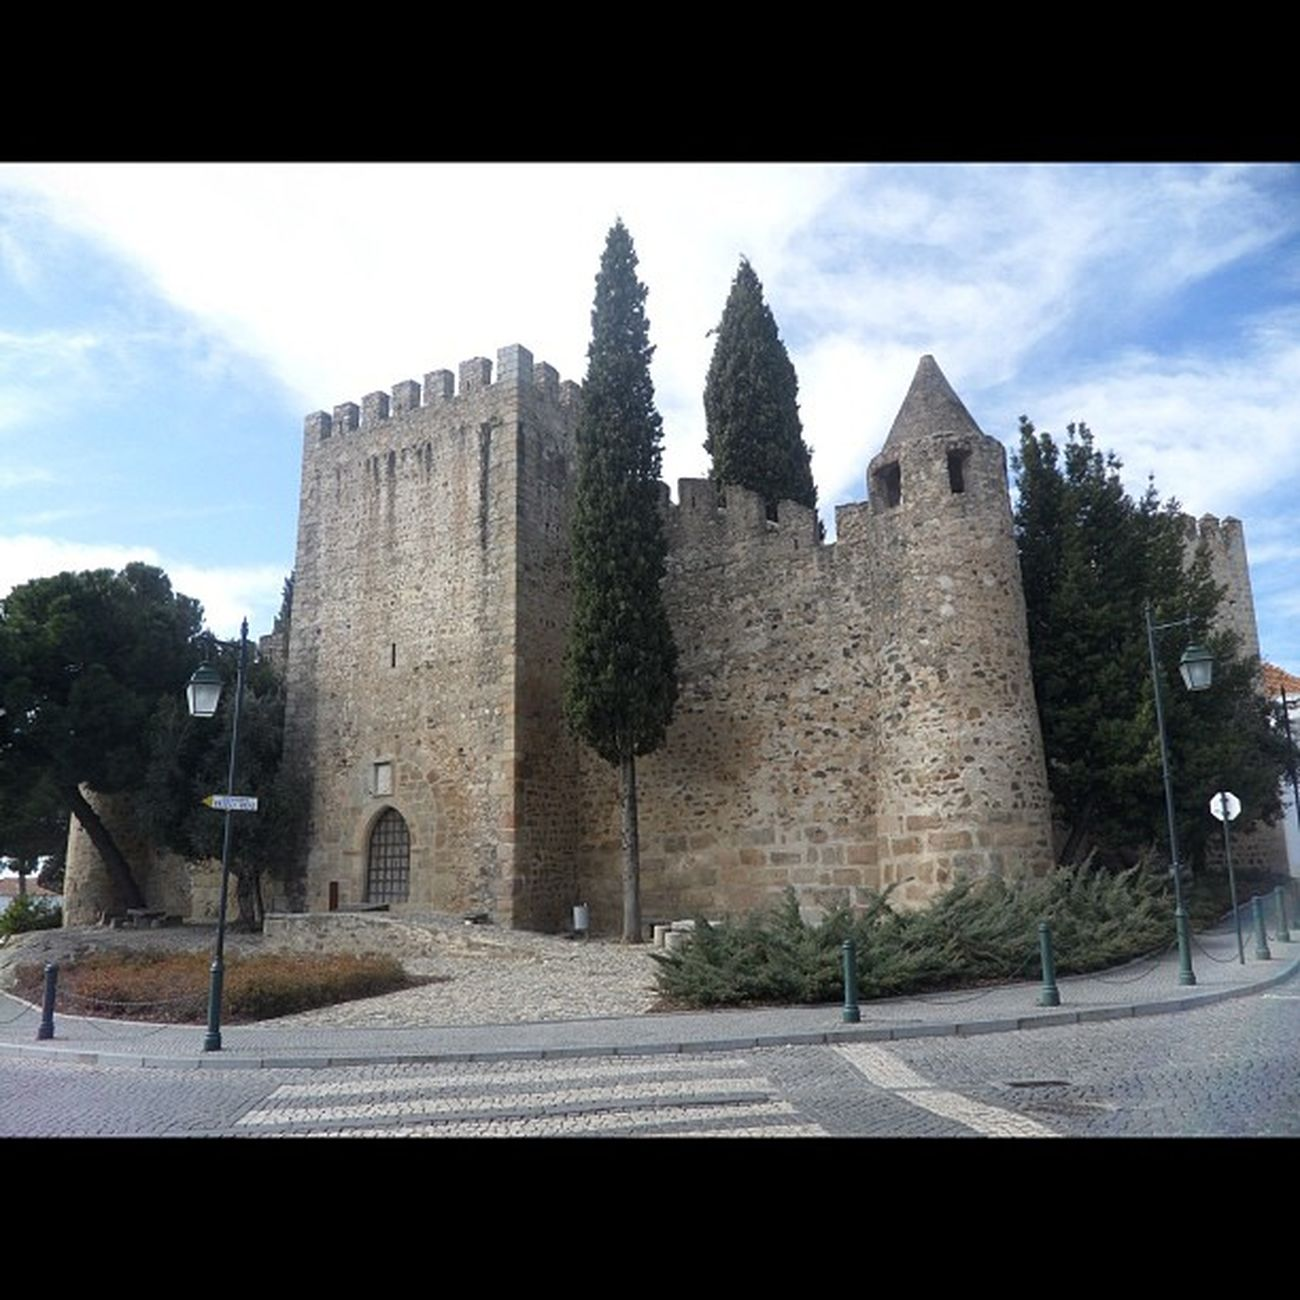 Castelo Igers Alentejo Igersportugal Castelosdeportugal Alterreal Alterdochao